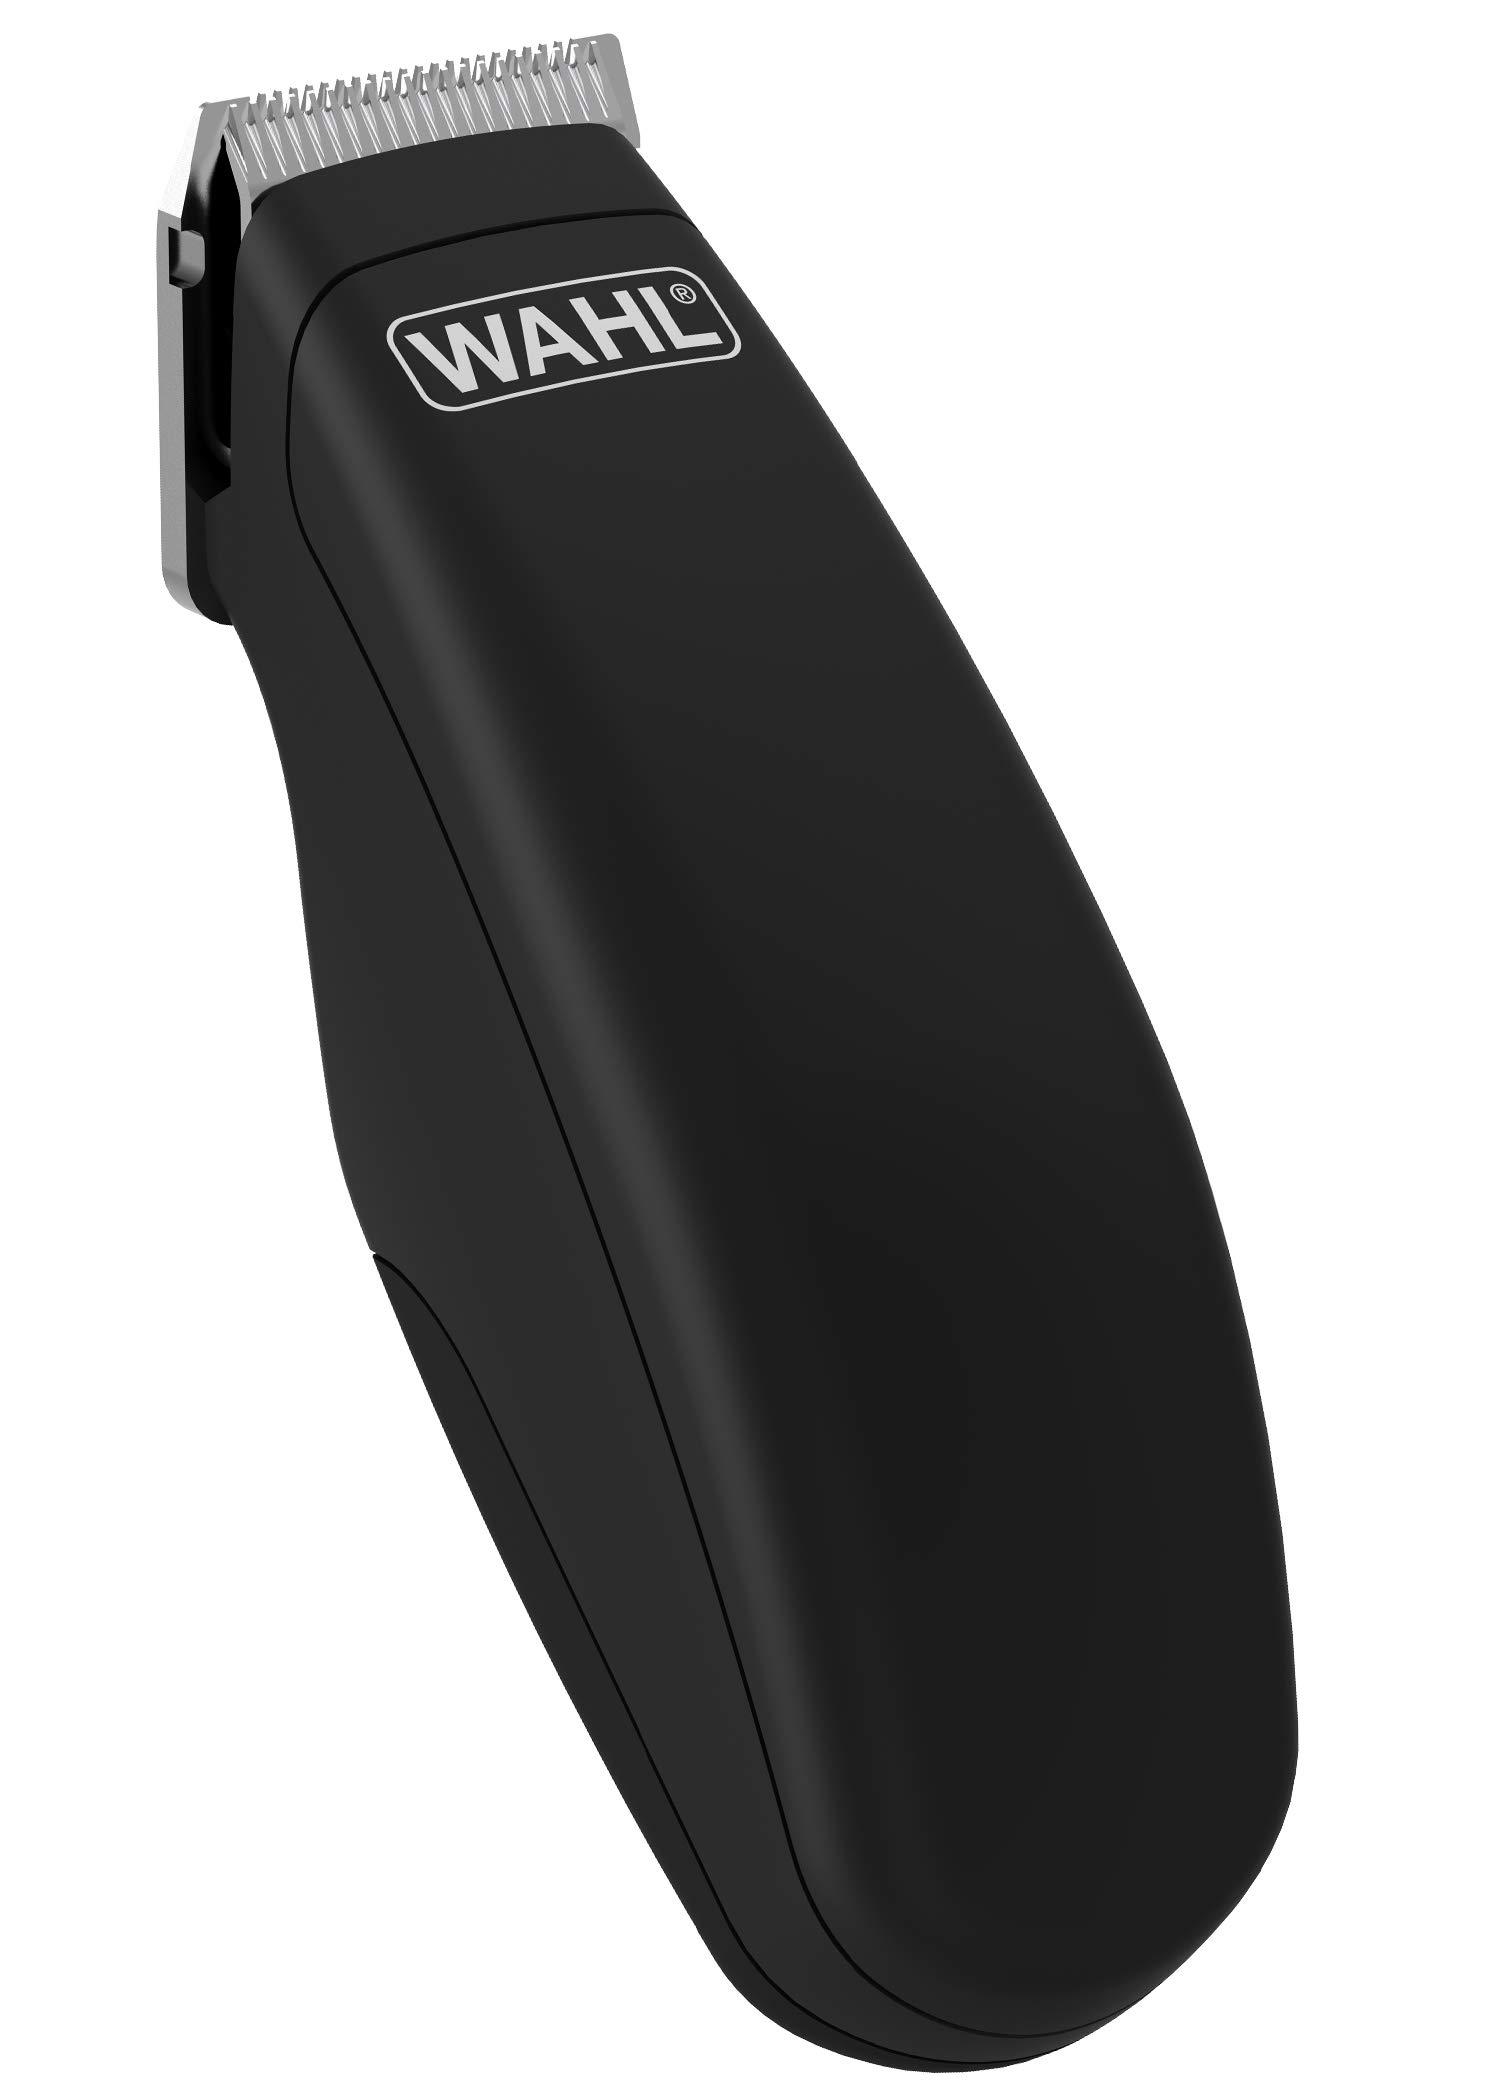 Wahl Beard Trimmer Men, Pocket Pro Hair Trimmers for Men, Stubble Trimmer, Male Grooming Set, Battery Powered